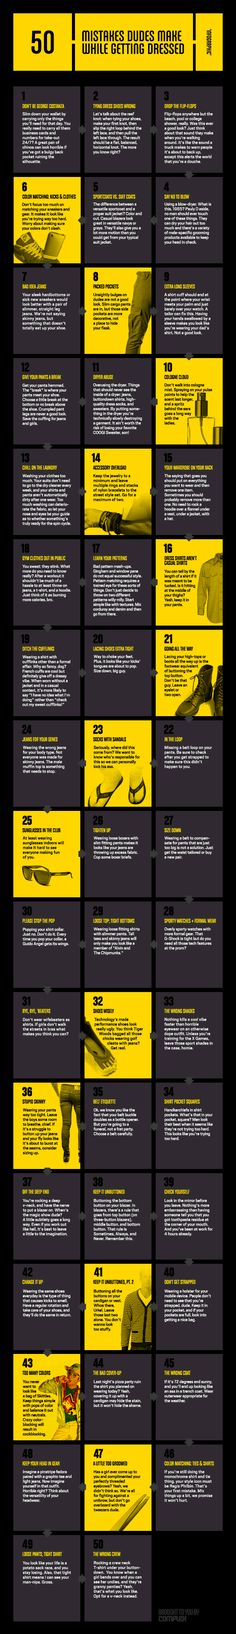 50 Mistakes dudes make while dressing #fashion